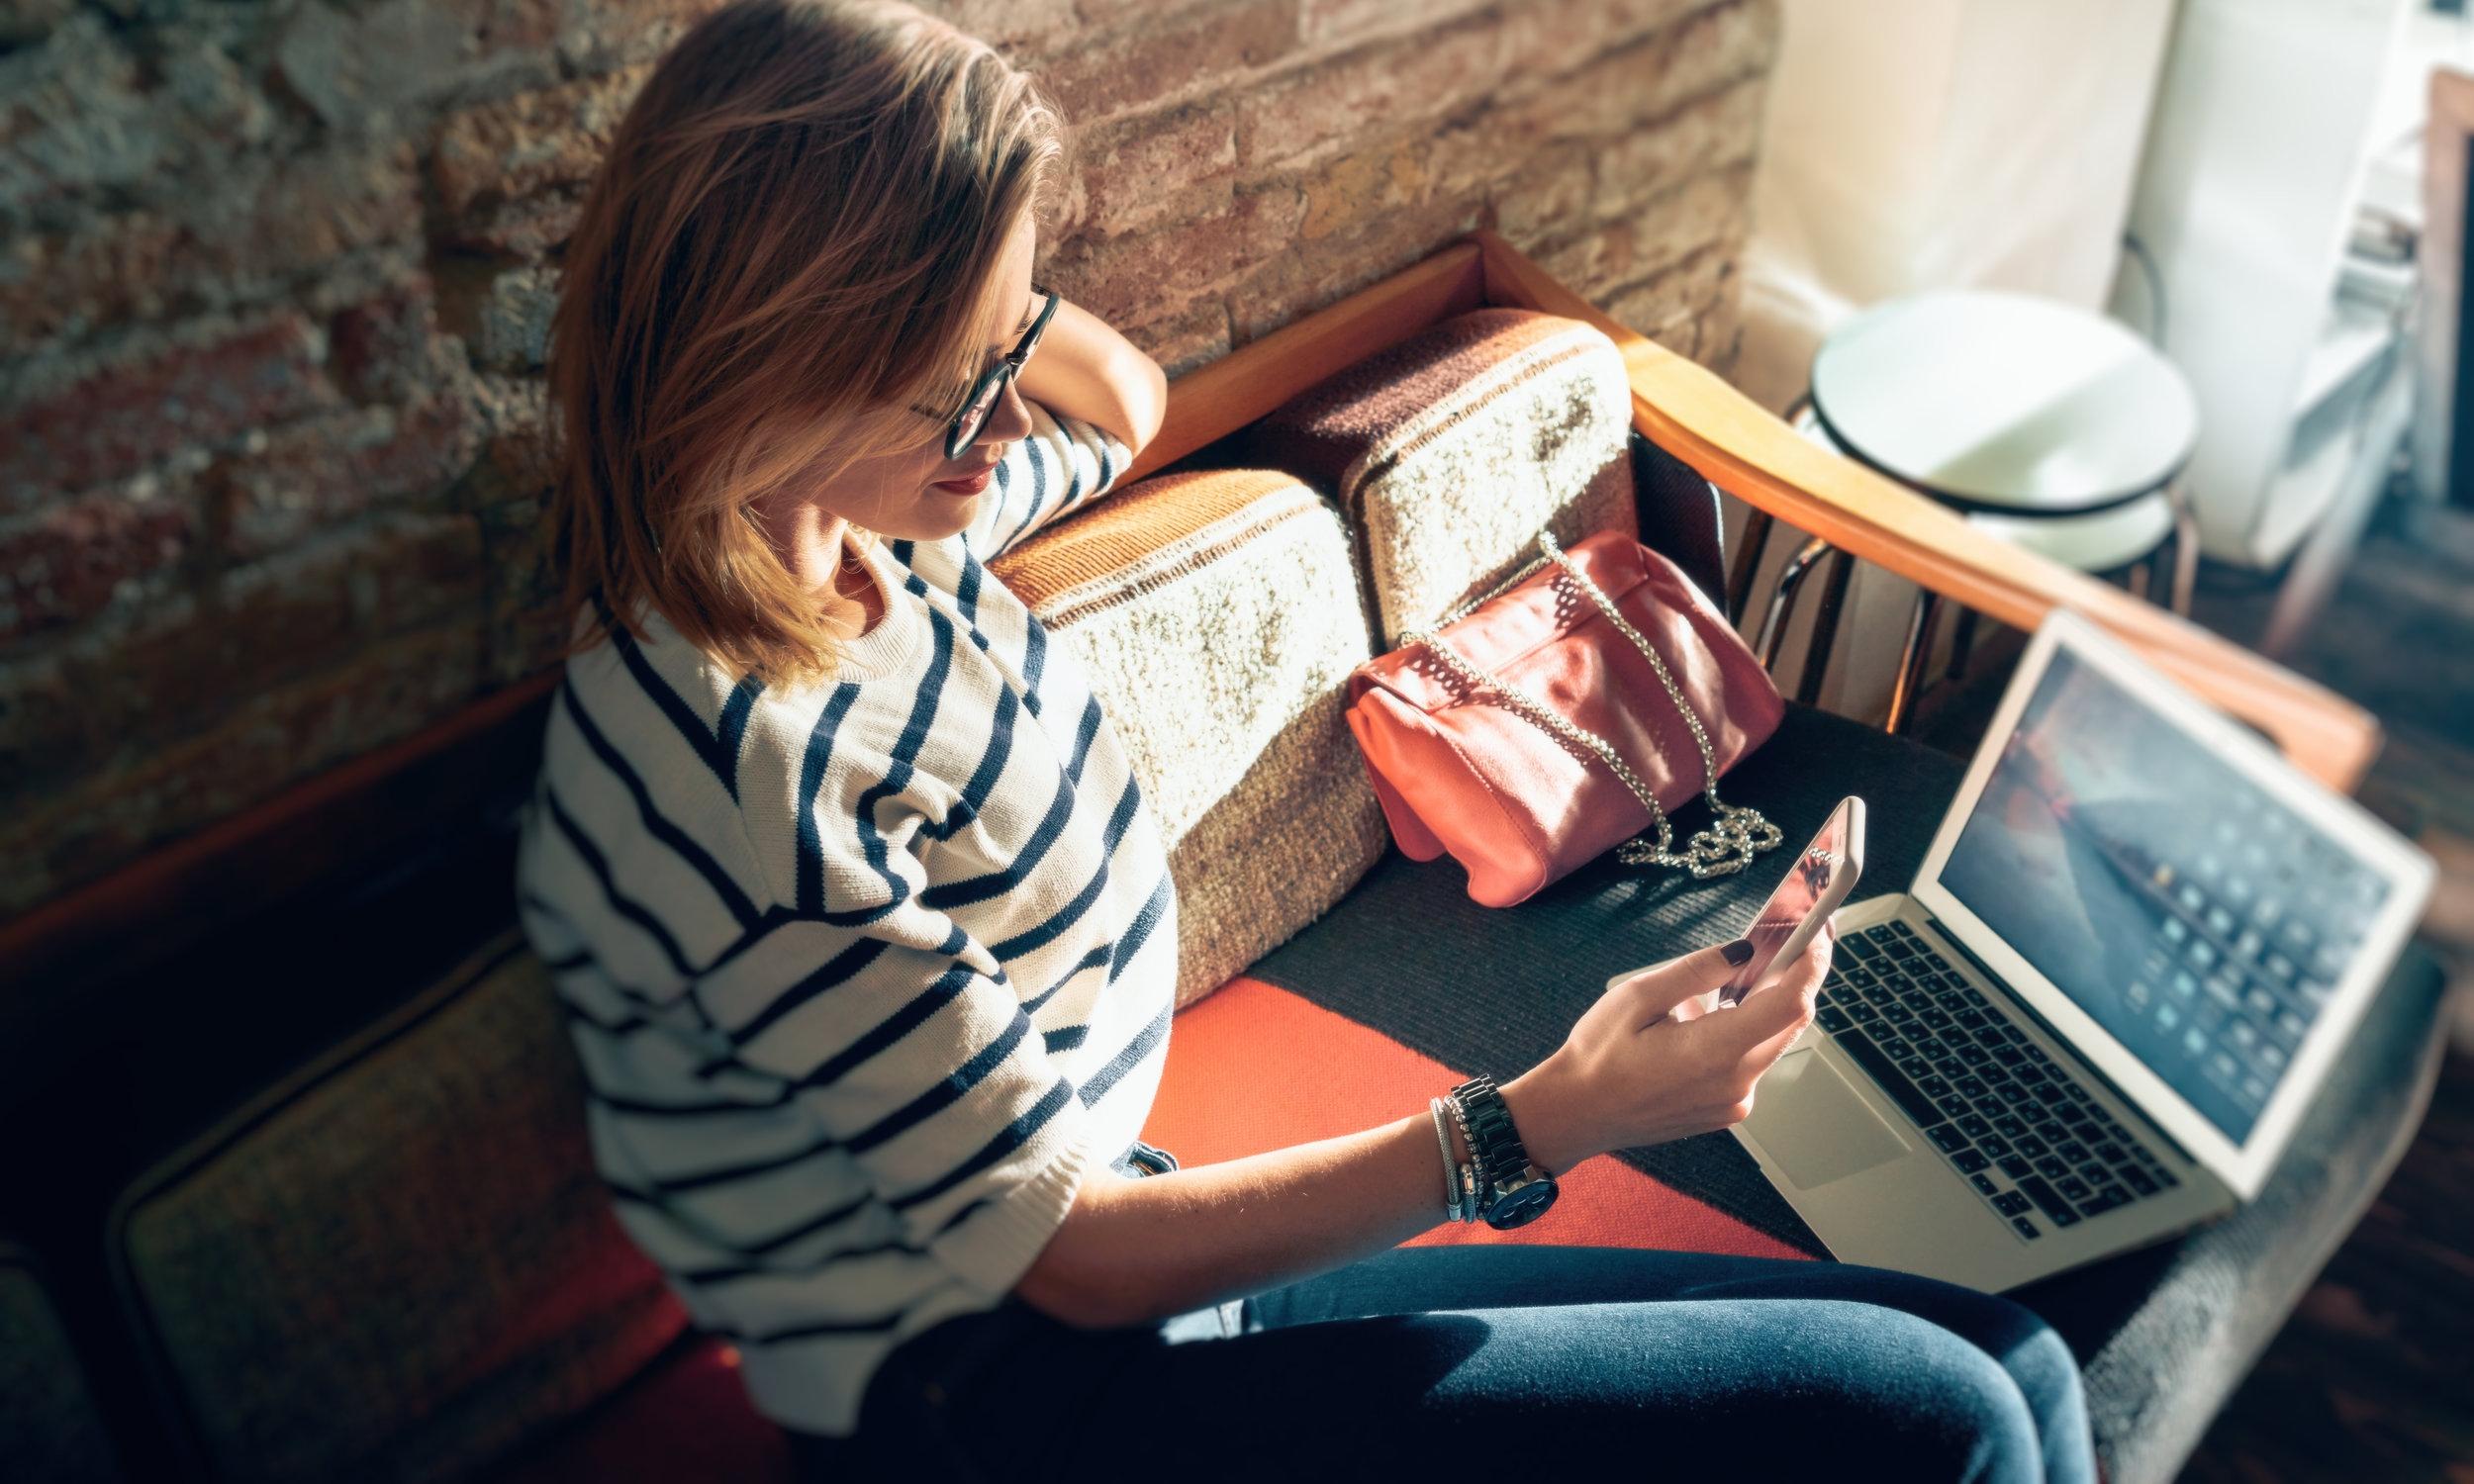 Photo of lady on a laptop